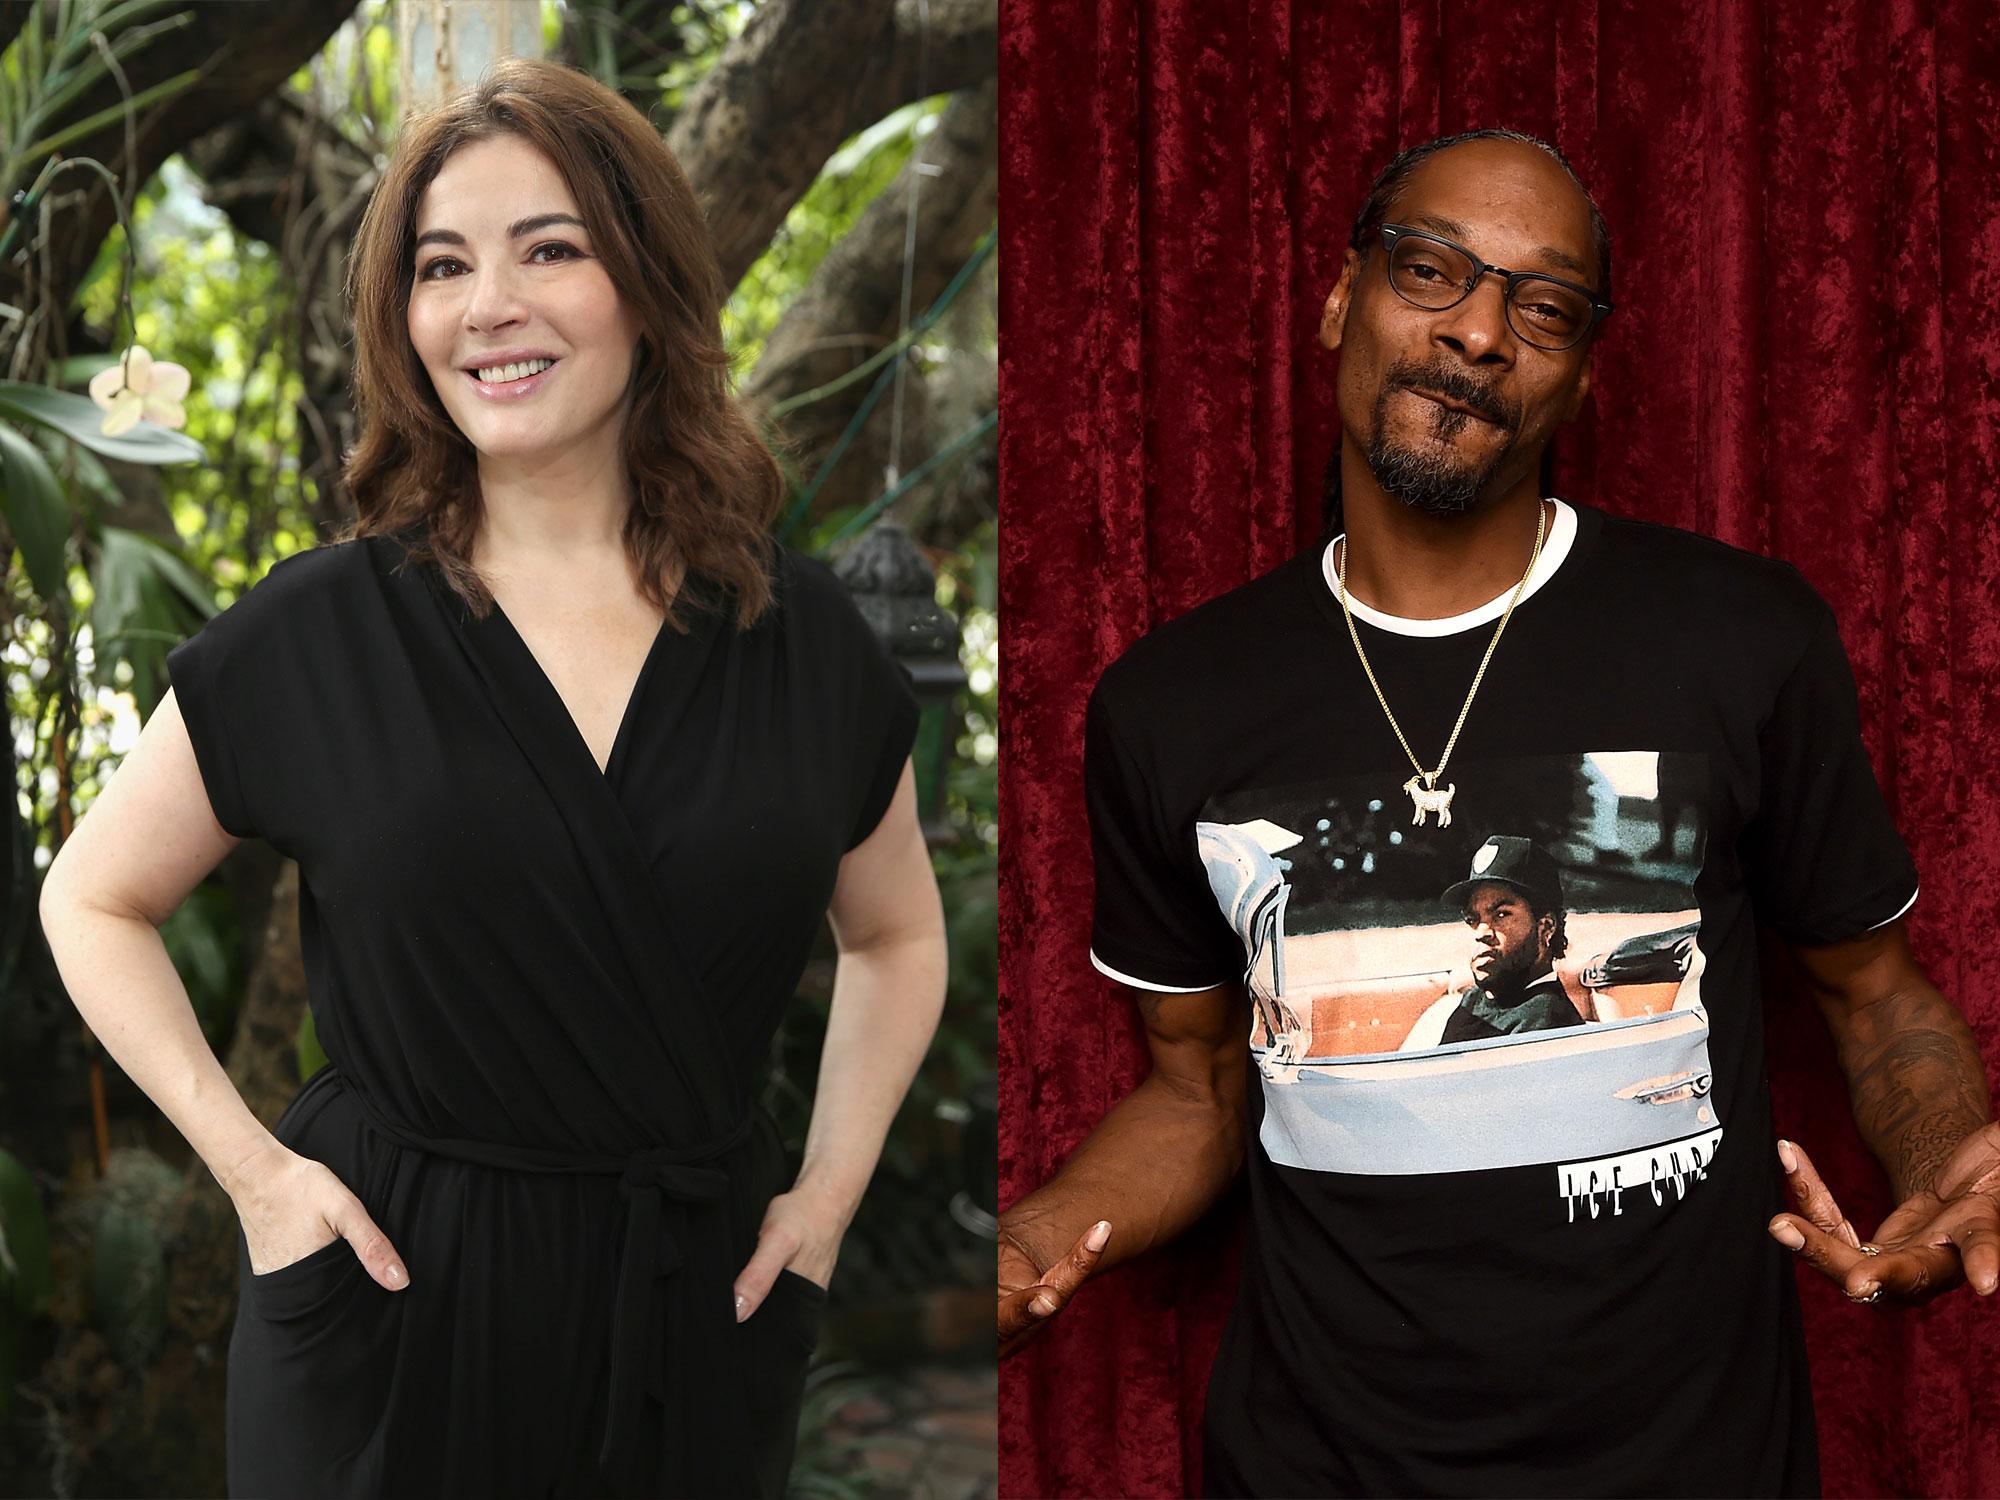 Cinnamon Roll Throwdown: Snoop Dogg vs Nigella Lawson